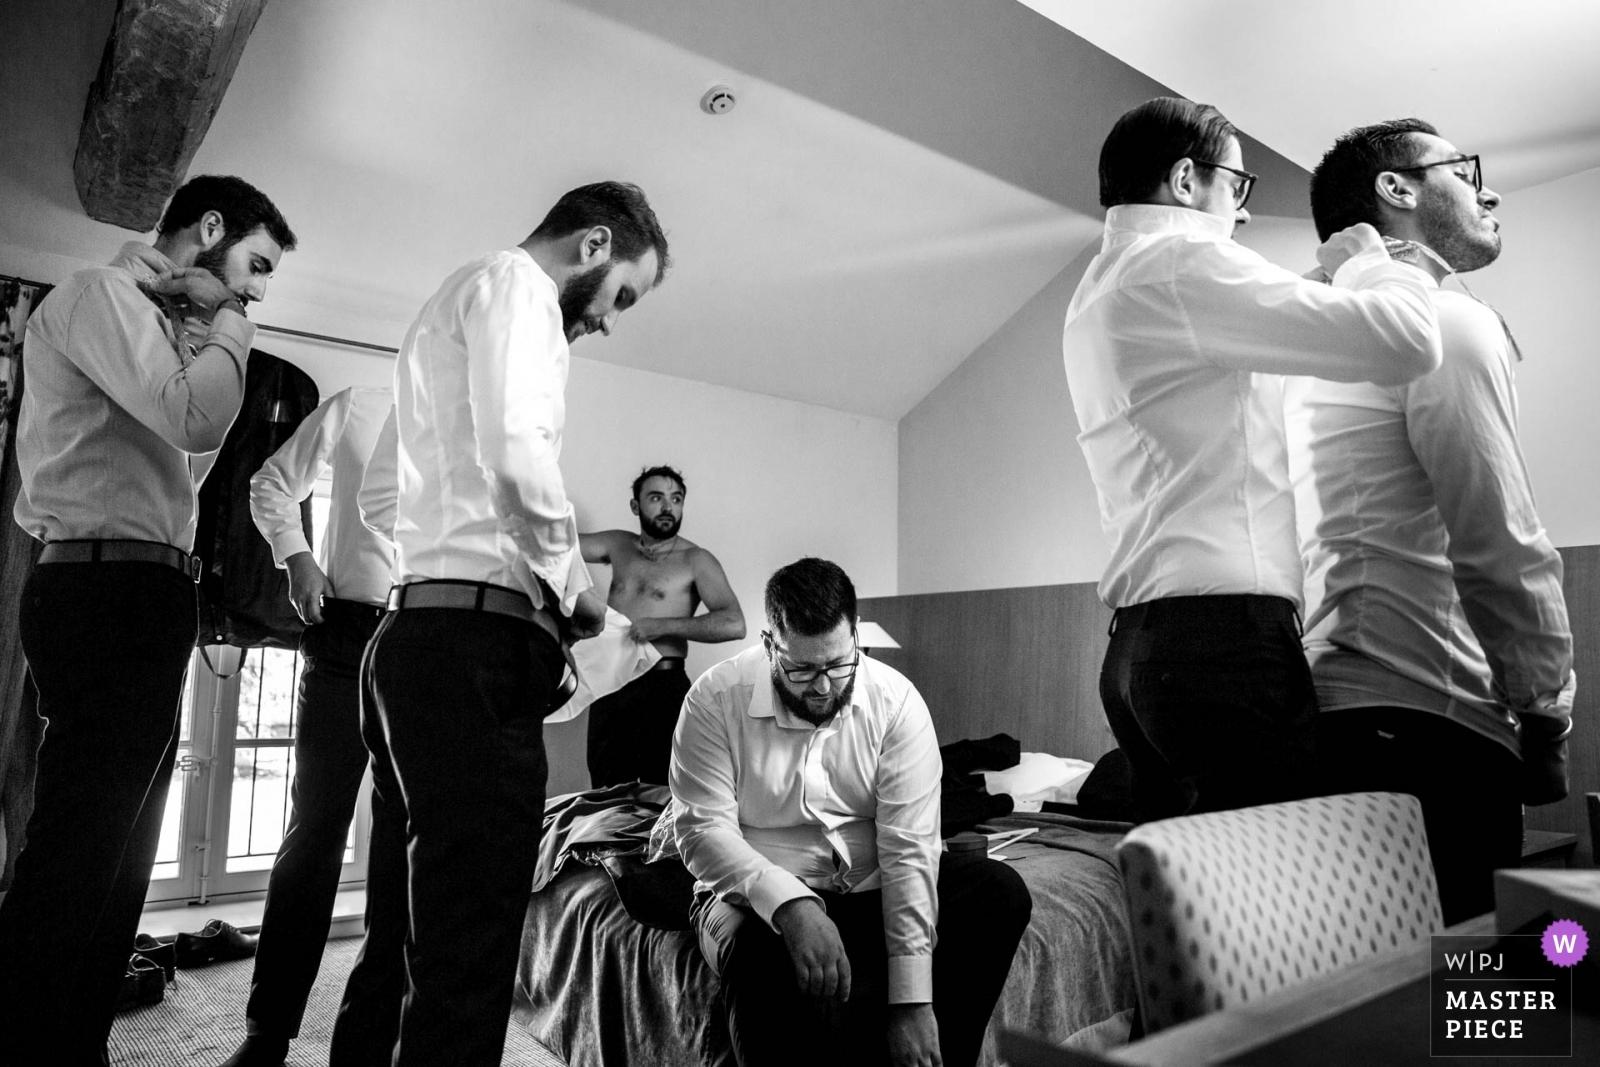 Getting ready, groom with his friends - Auvergne-Rhône-Alpes, France Wedding Photography -  | Château des broyers